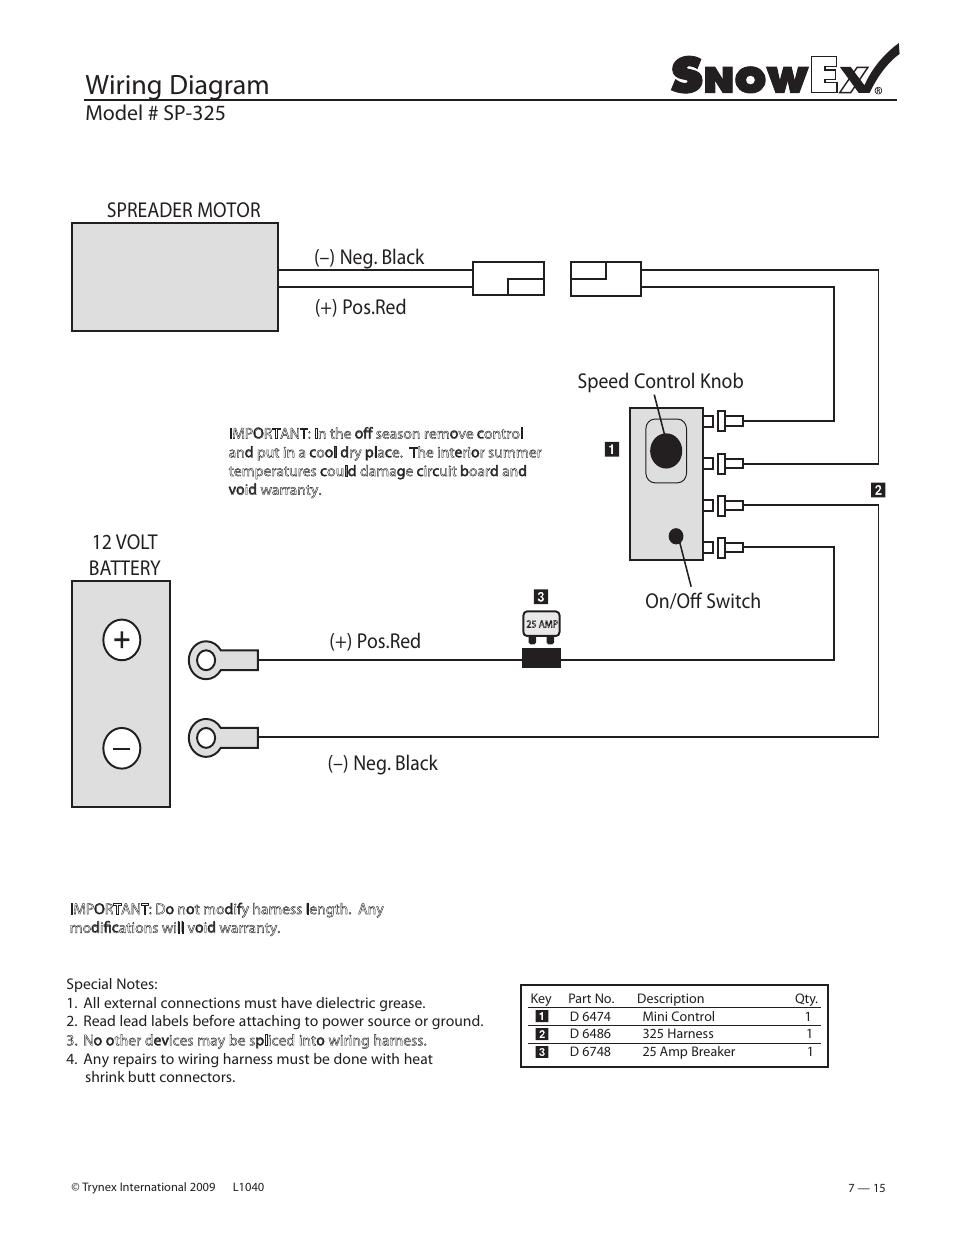 hight resolution of snowex wiring diagram 2500 books of wiring diagram u2022 snowex salt spreaders snowex 8500 wiring diagram